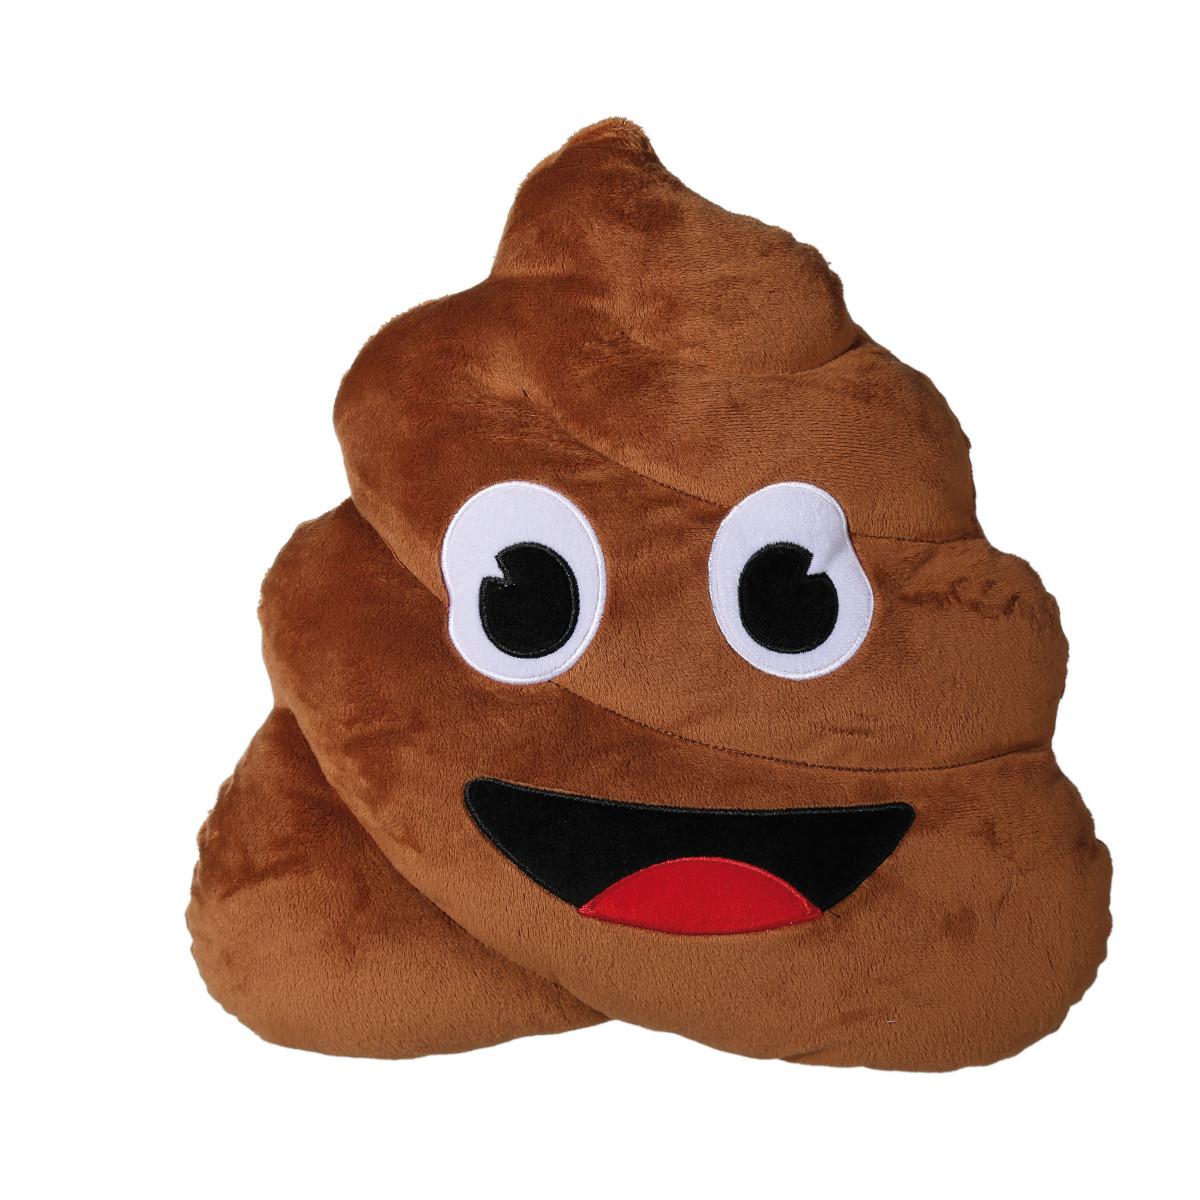 Plüschkissen Pile of Poo